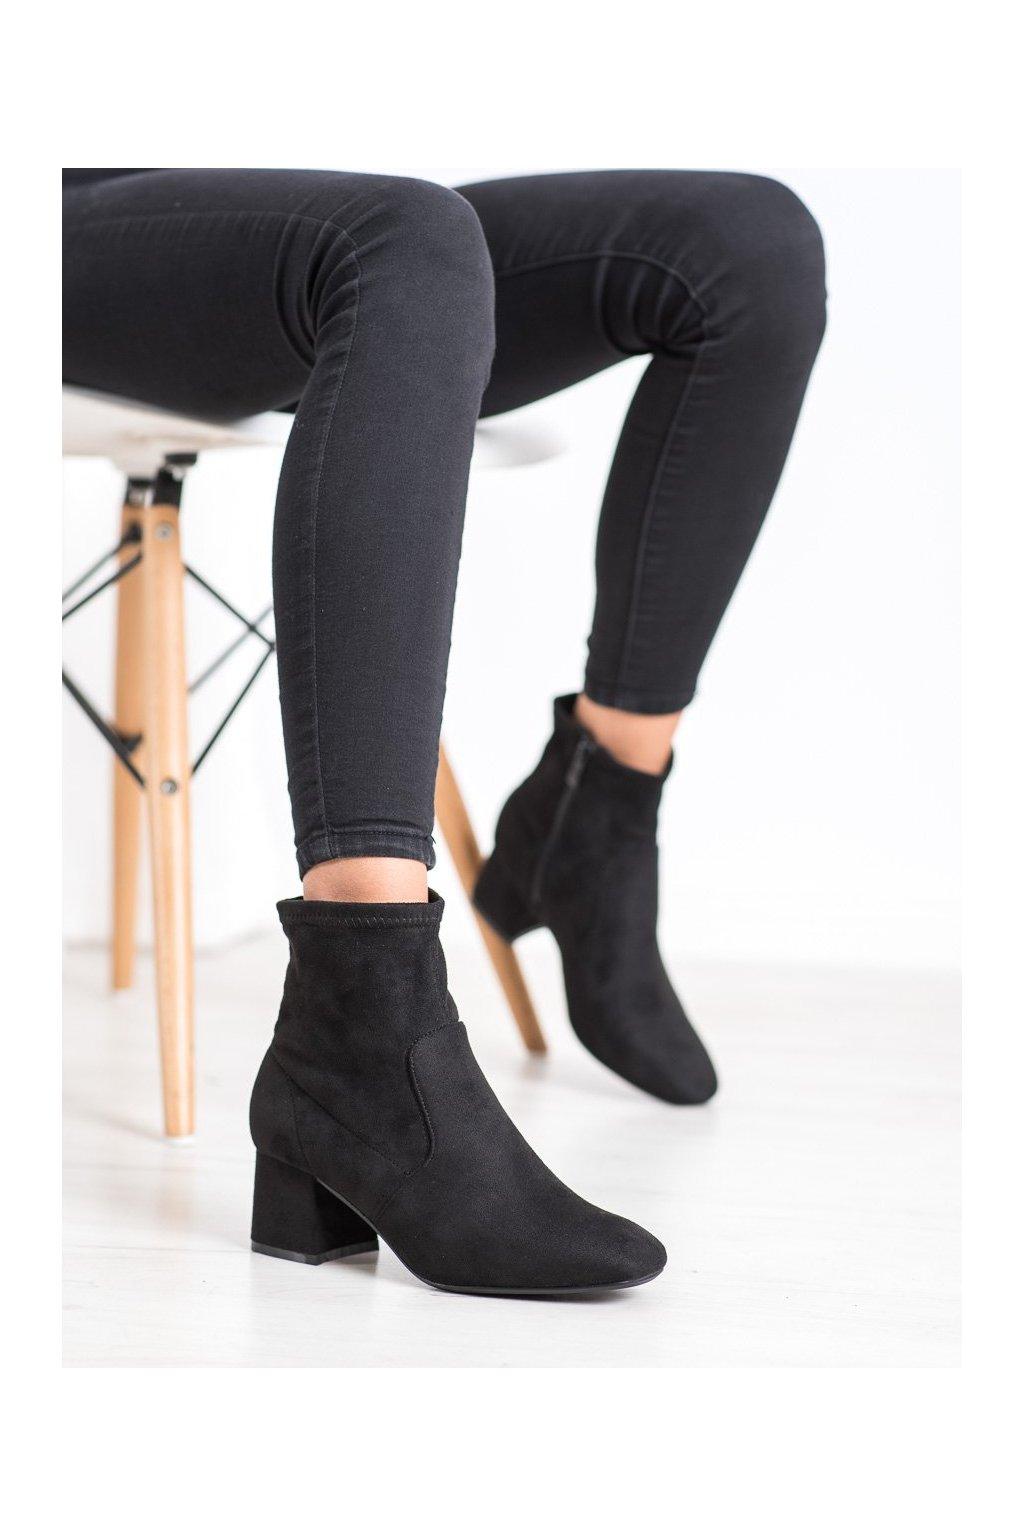 Čierne dámske topánky Cm paris kod 688-A72B